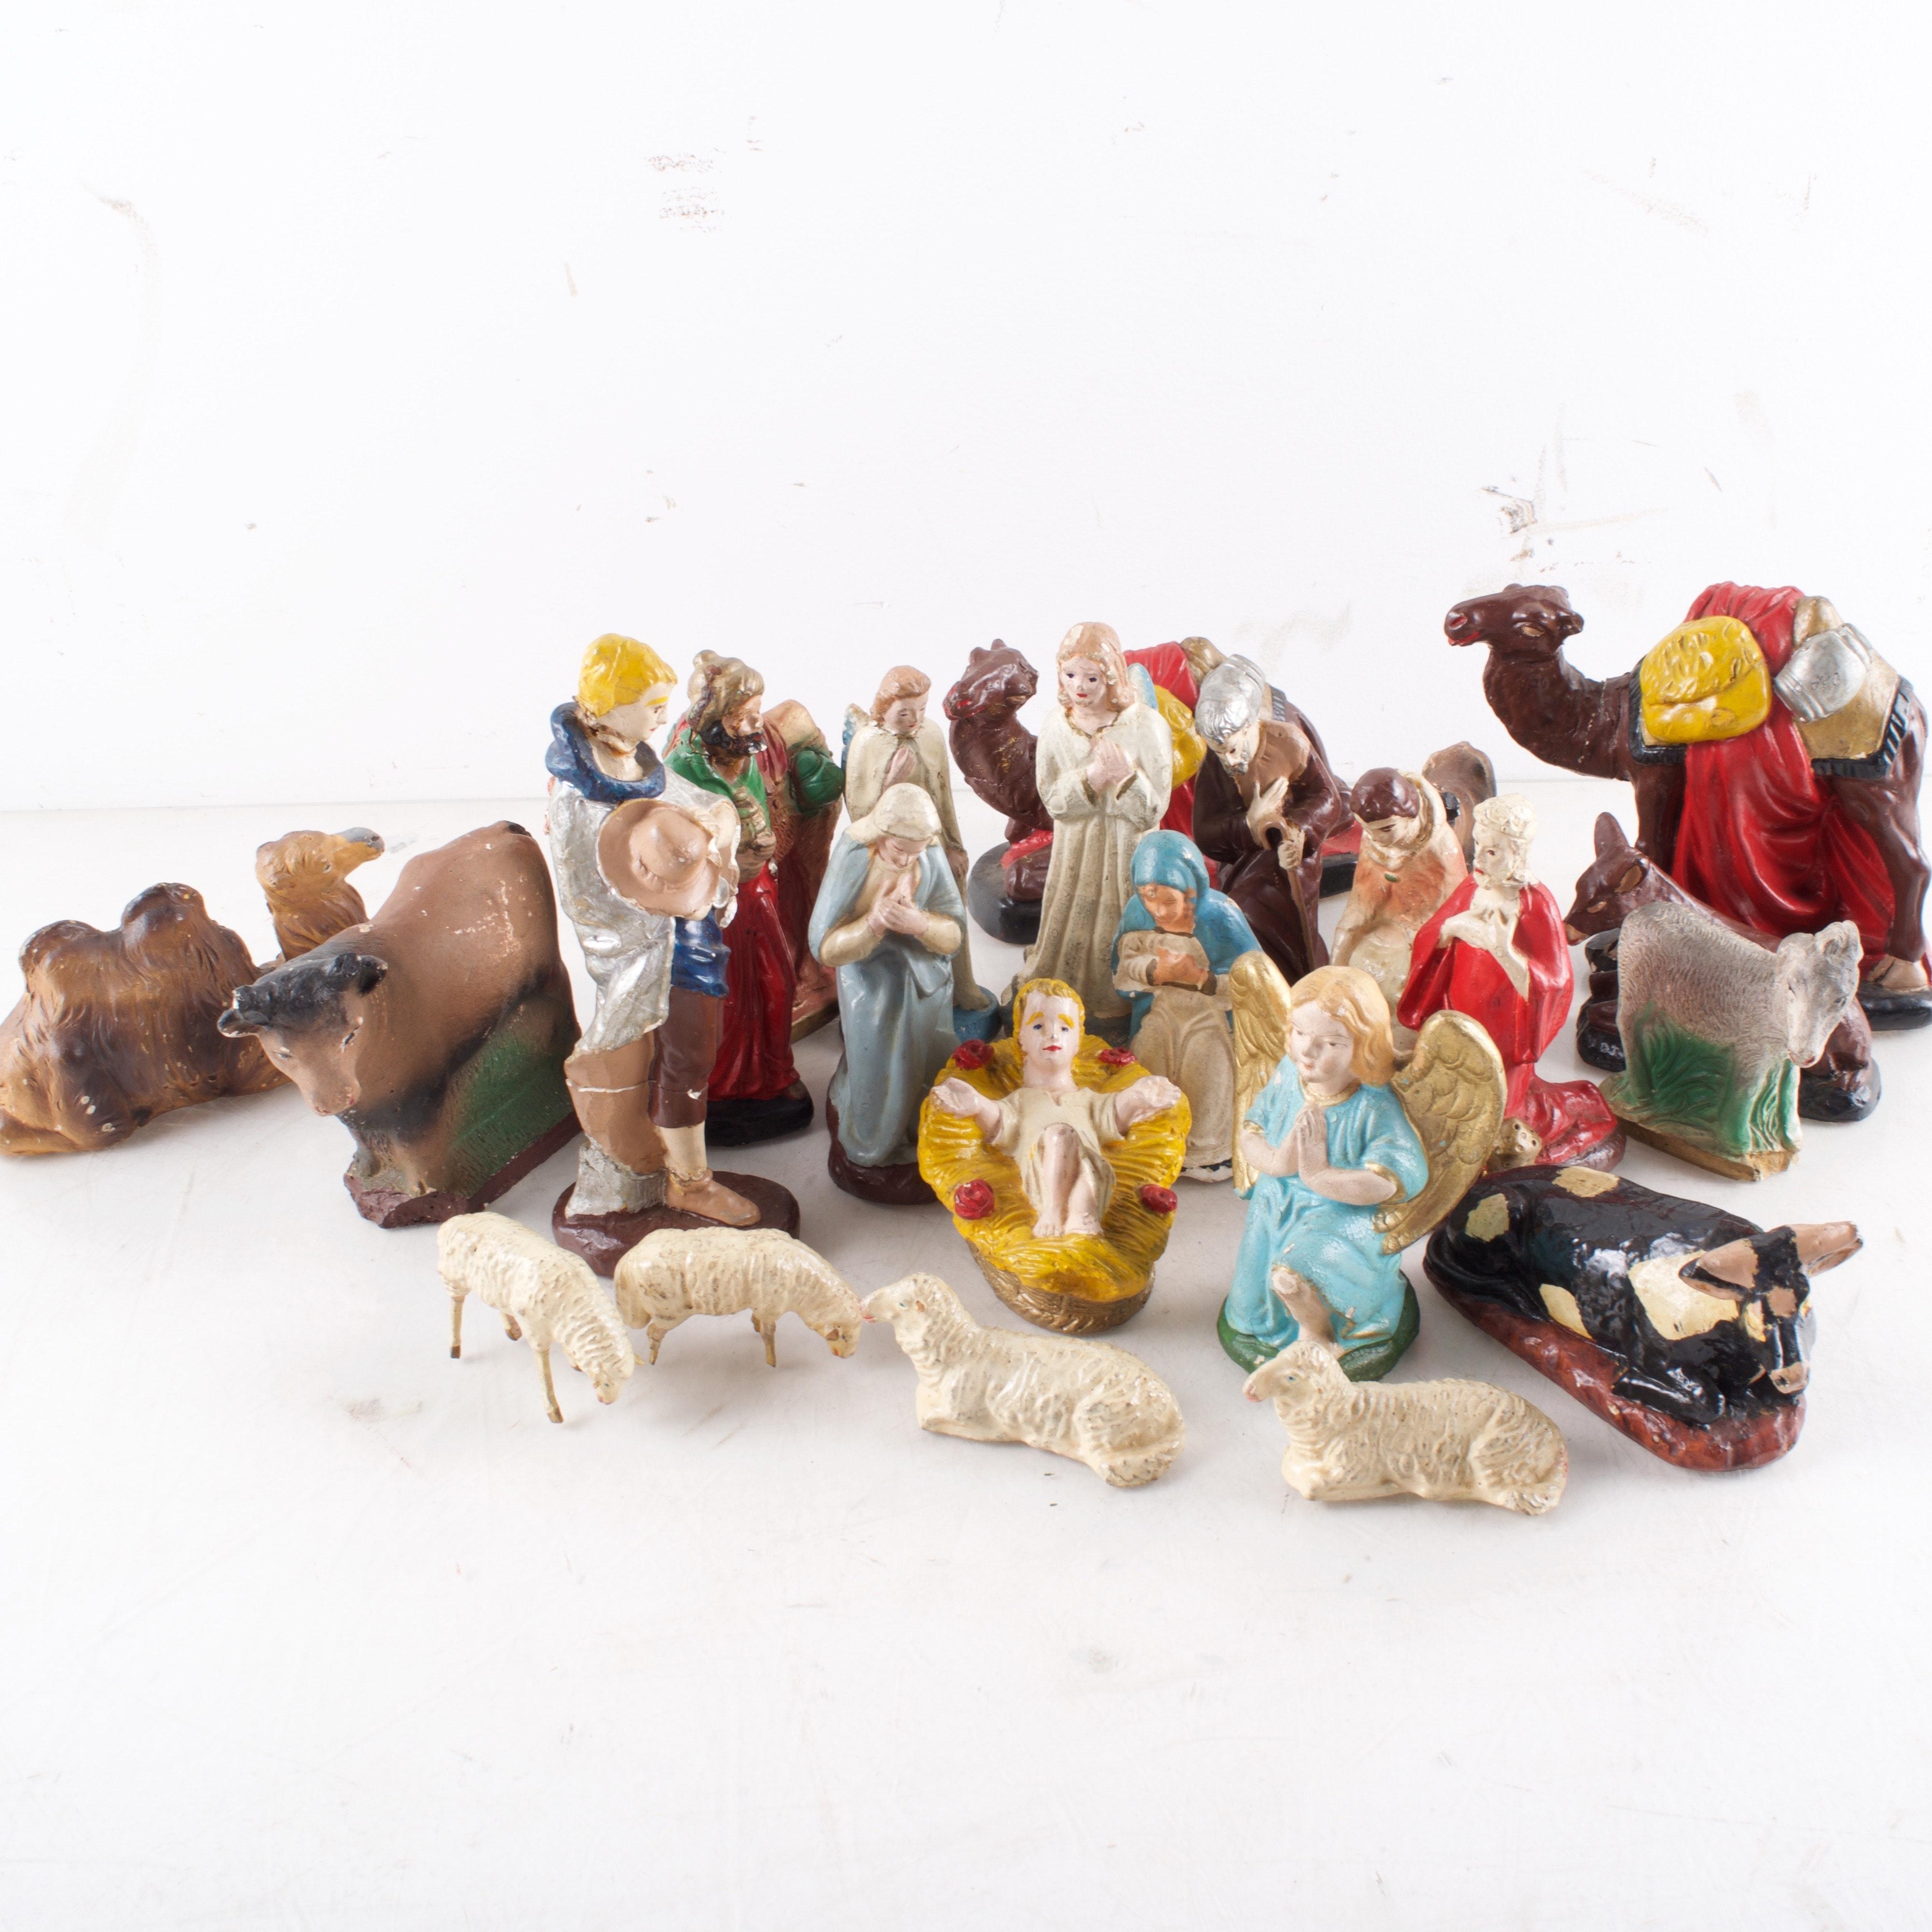 Vintage Hand-Painted Nativity Set